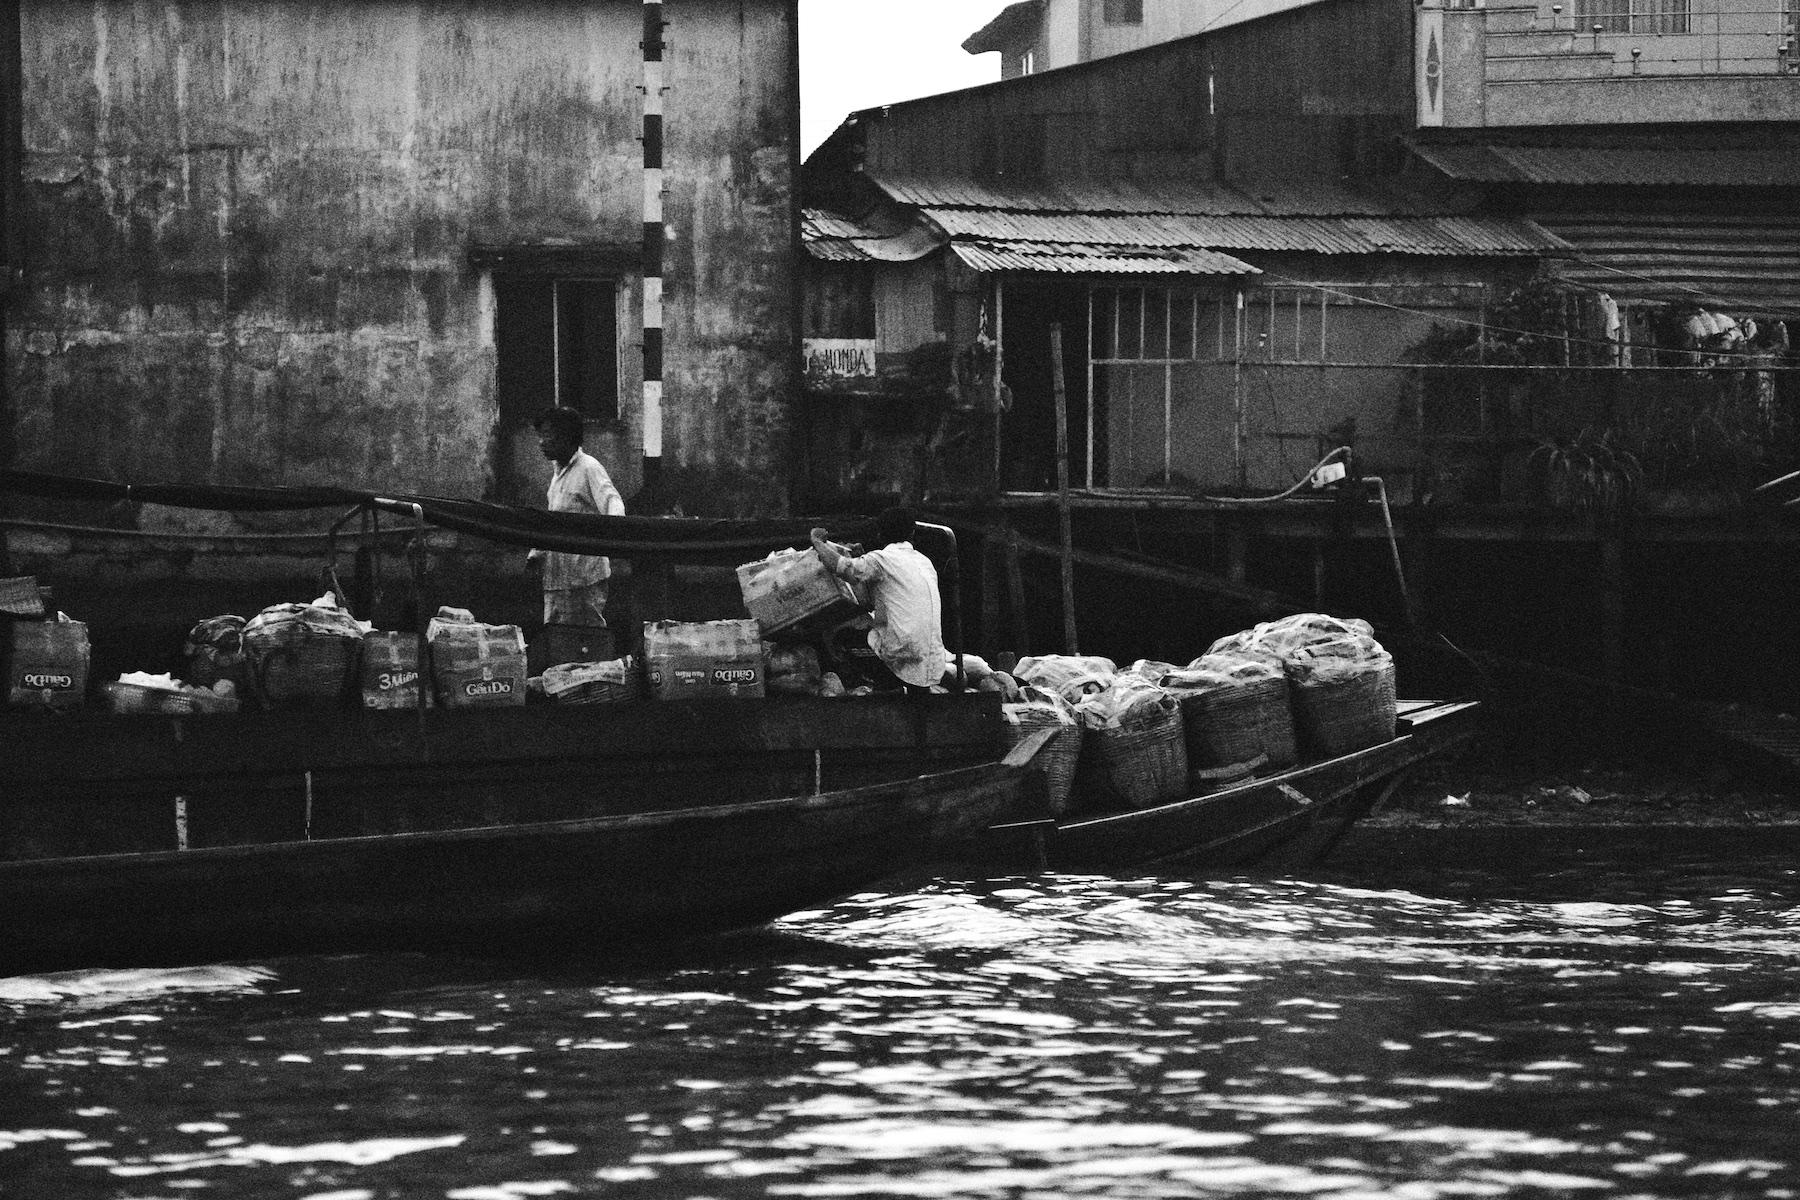 MEKONG DELTA VIETNAM © Manoah Biesheuvel 11